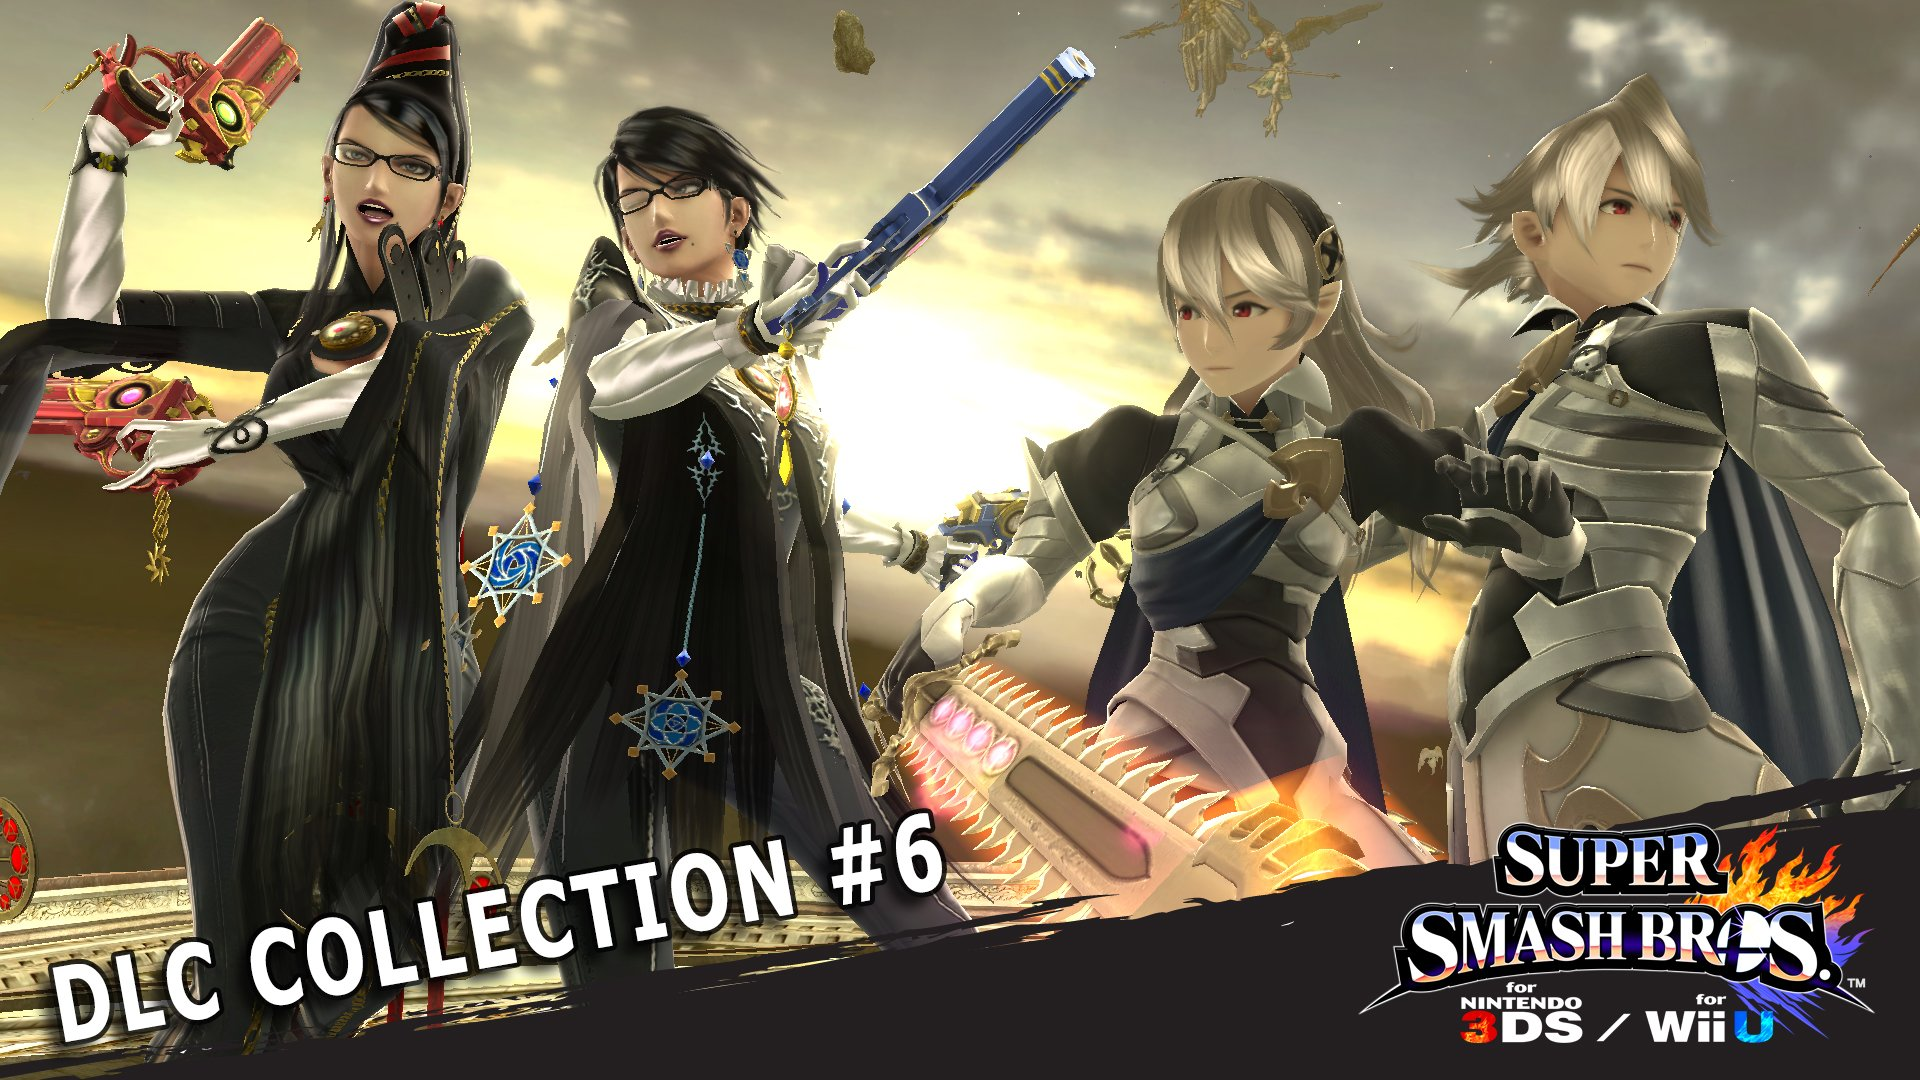 Super Smash Bros. DLC Collection #6 - Wii U [Digital Code]